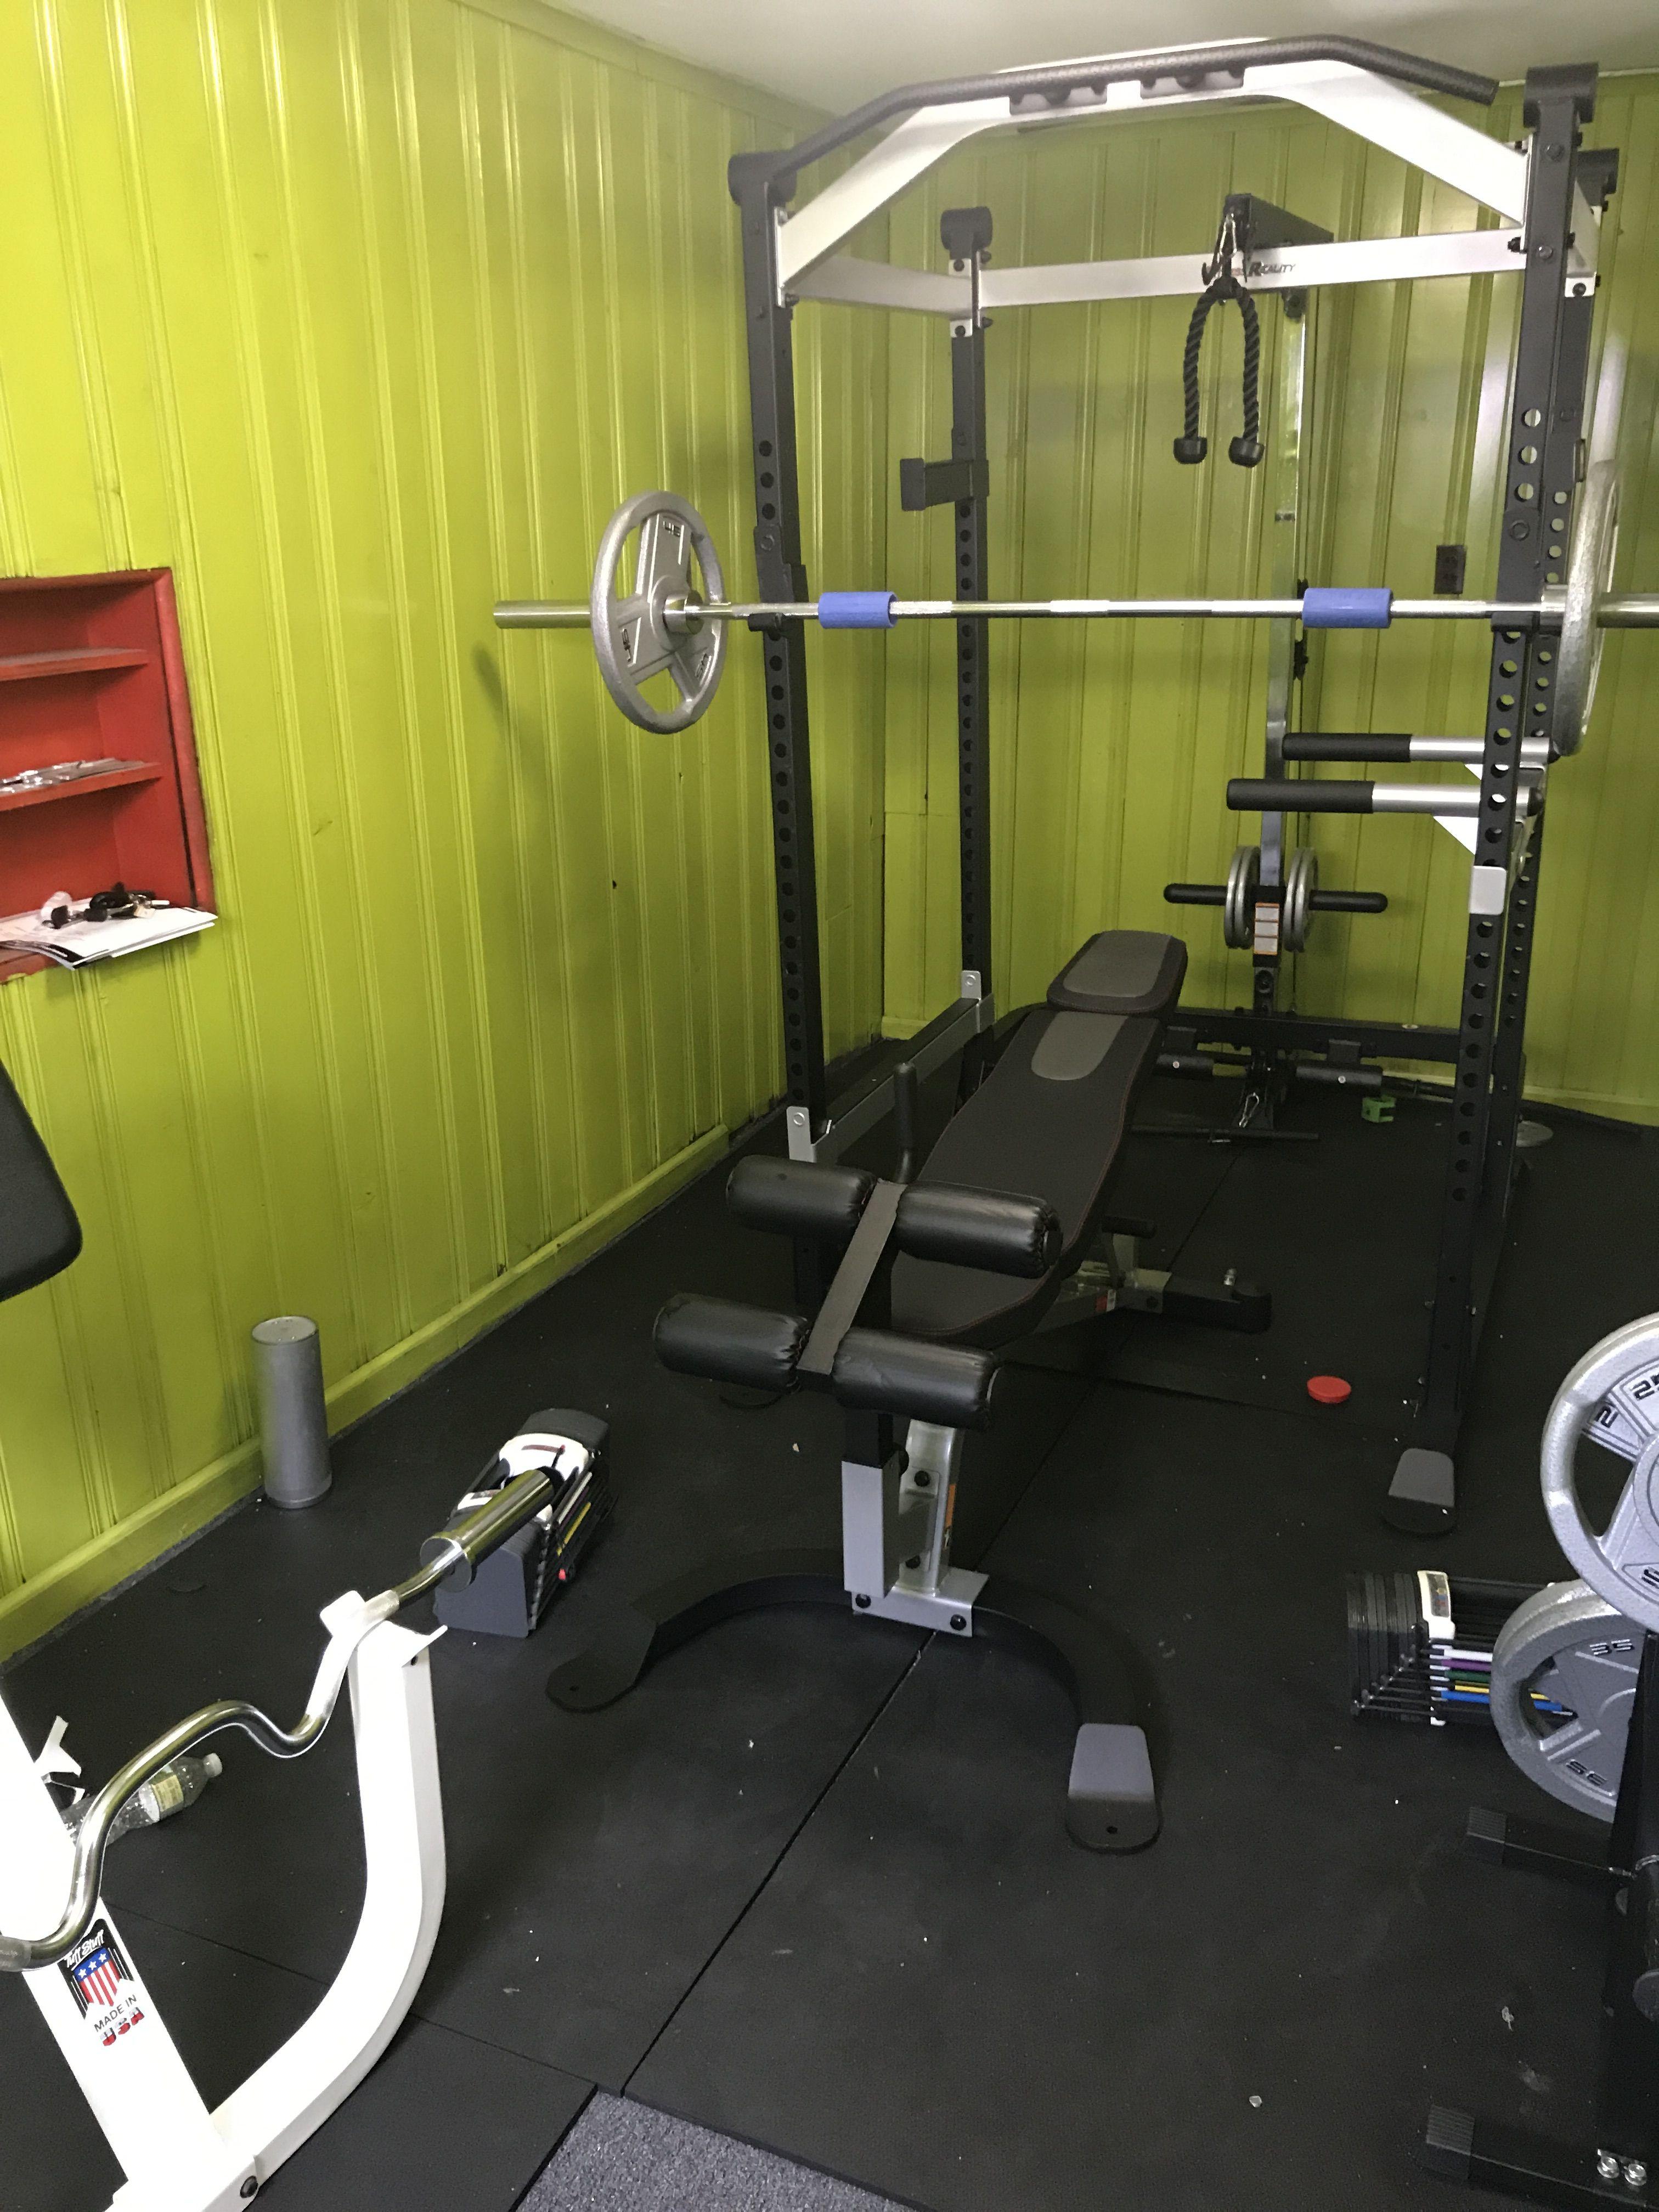 Pin By Mike Jr On Garage Gym Home Gym Design Home Gym Garage Gym Room